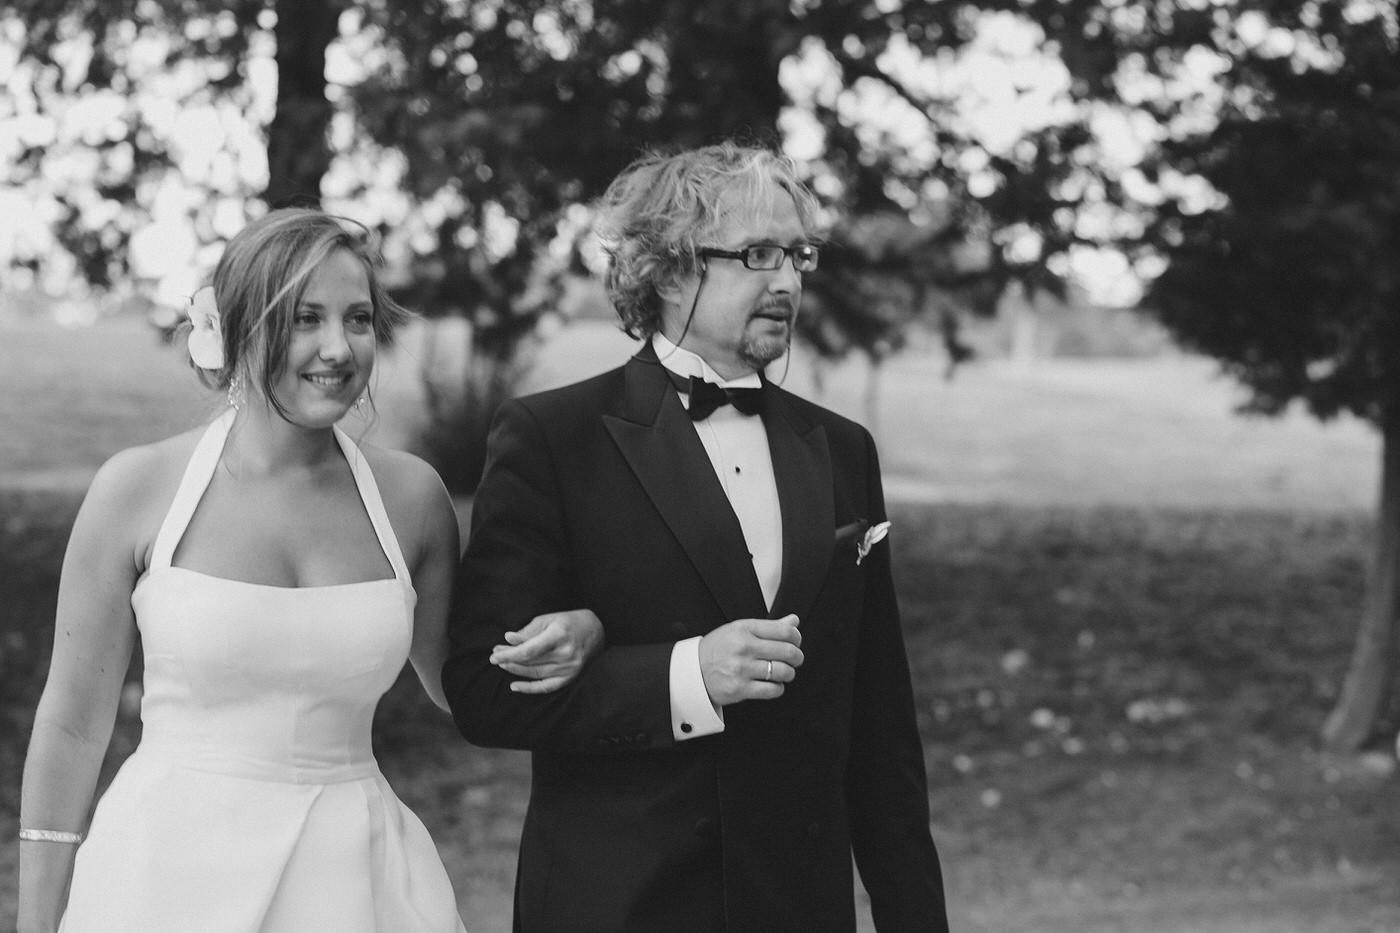 cyprus-wedding-photographer-19.JPG